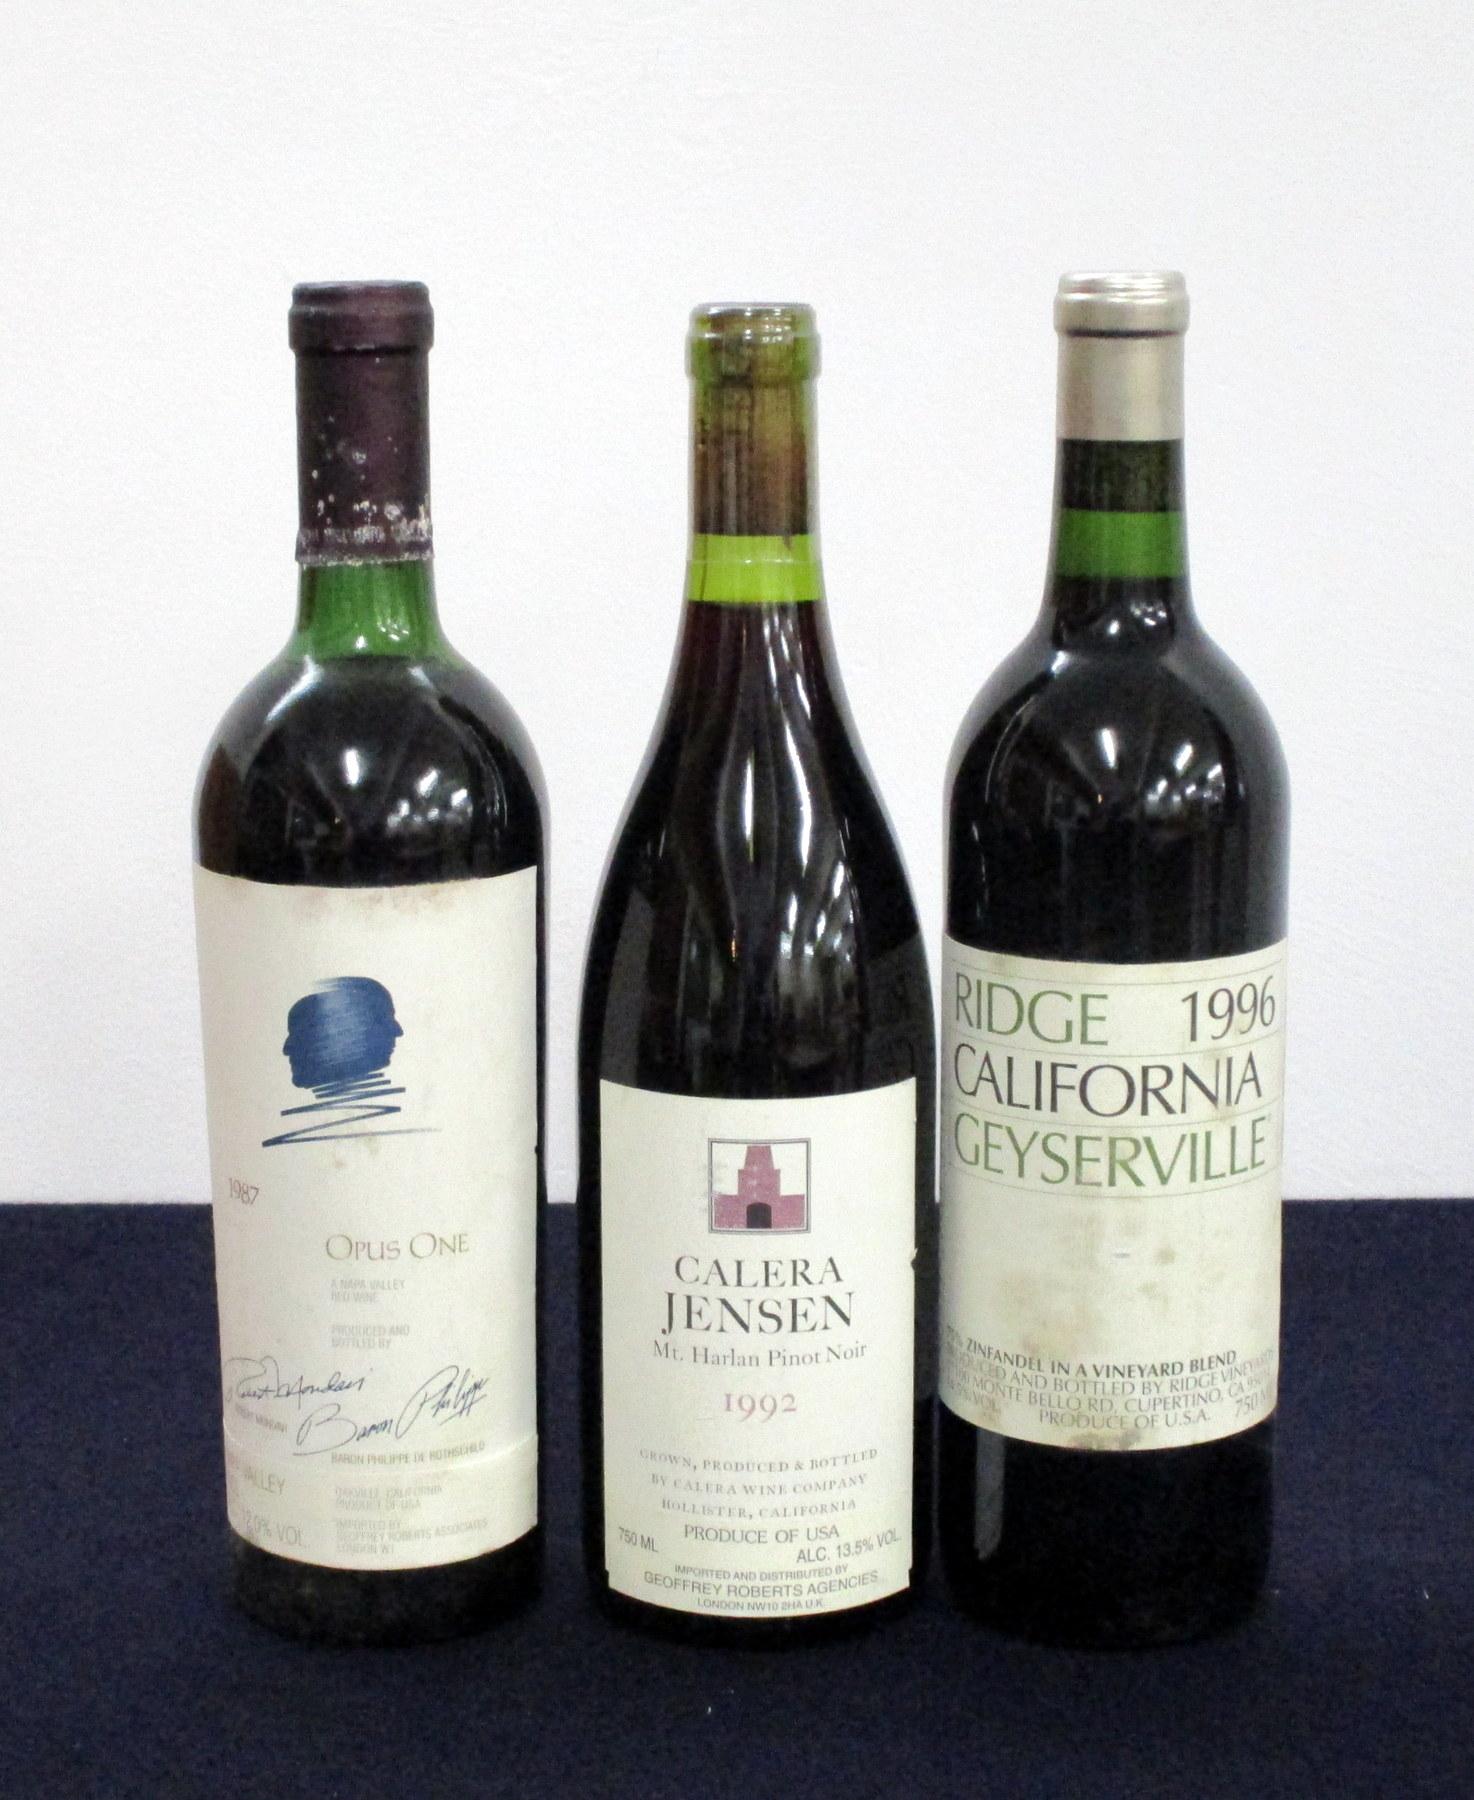 1 bt Opus One Mondavi Rothschild 1987 Napa Valley us, foil sl crusted, vsl stl 1 bt Calera Jenson